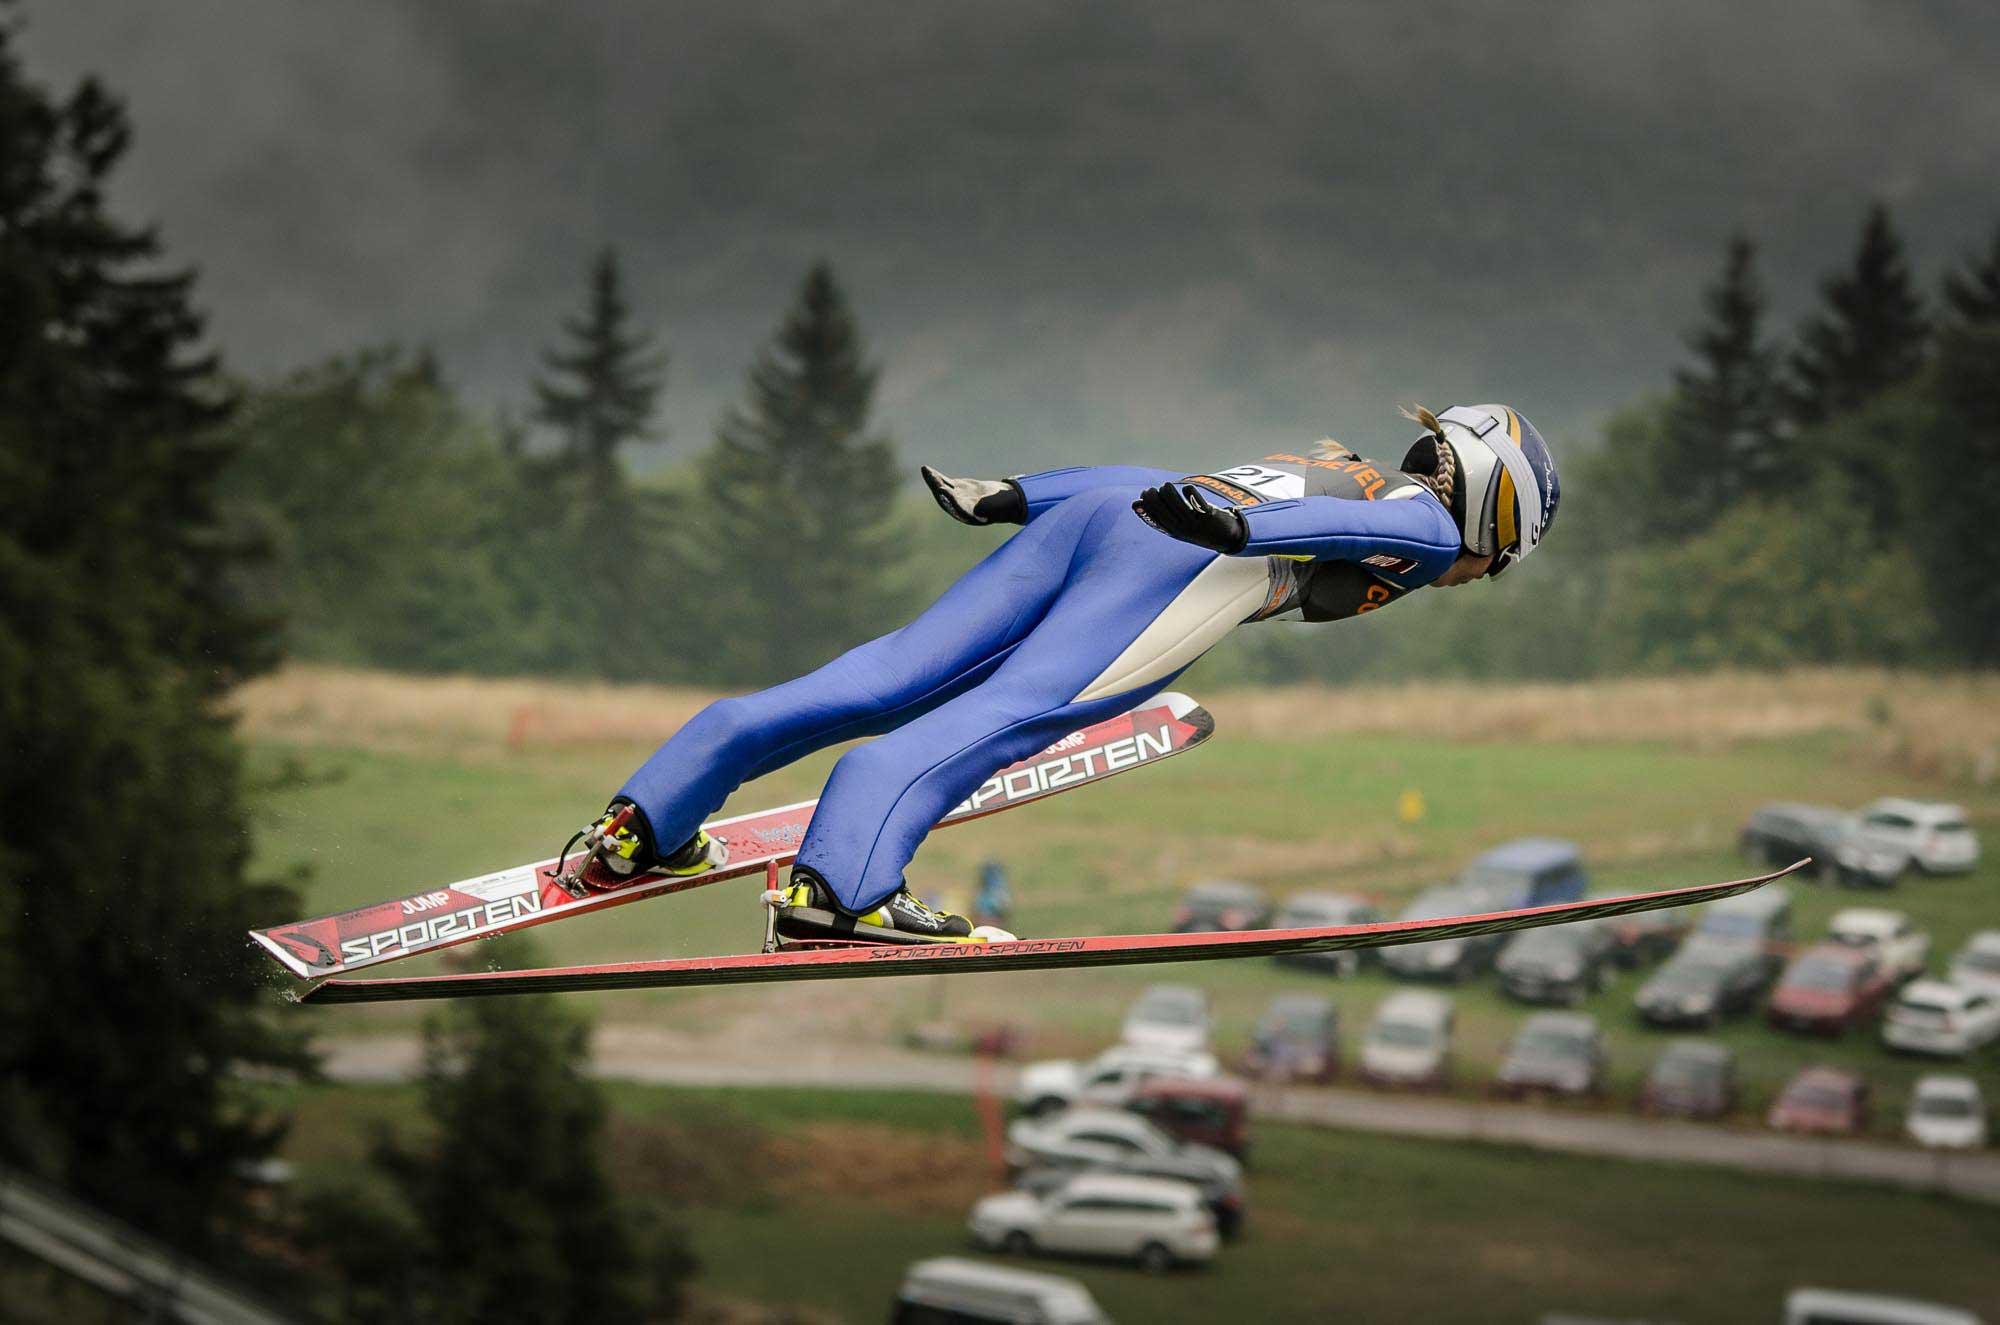 Saut ski courchevel world cup - Coupe du monde de ski courchevel ...